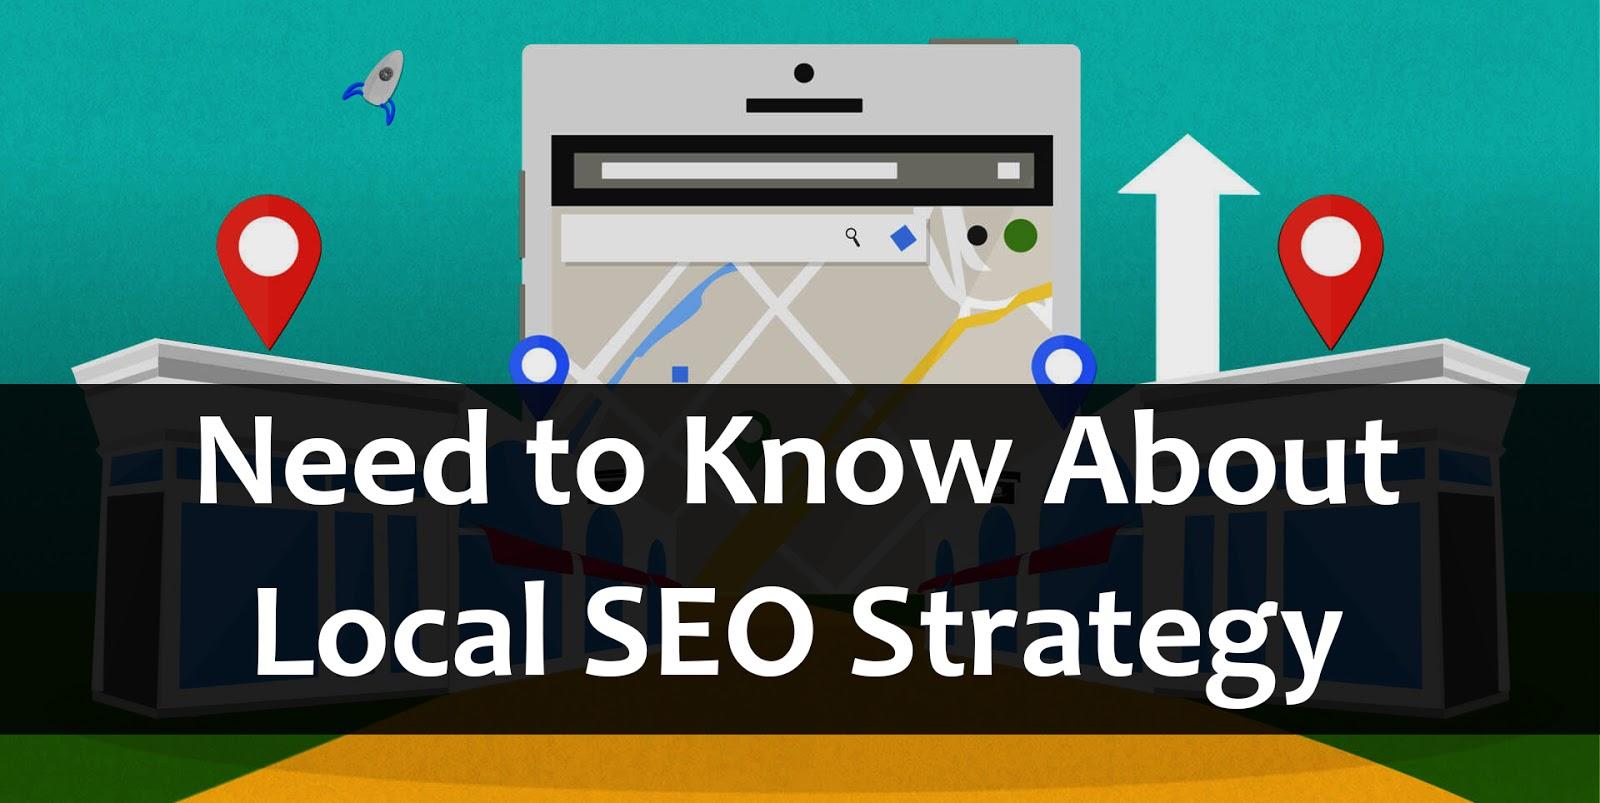 local seo definition, how to do local seo,local seo strategy,local seo factors, what is local seo marketing, local seo google,